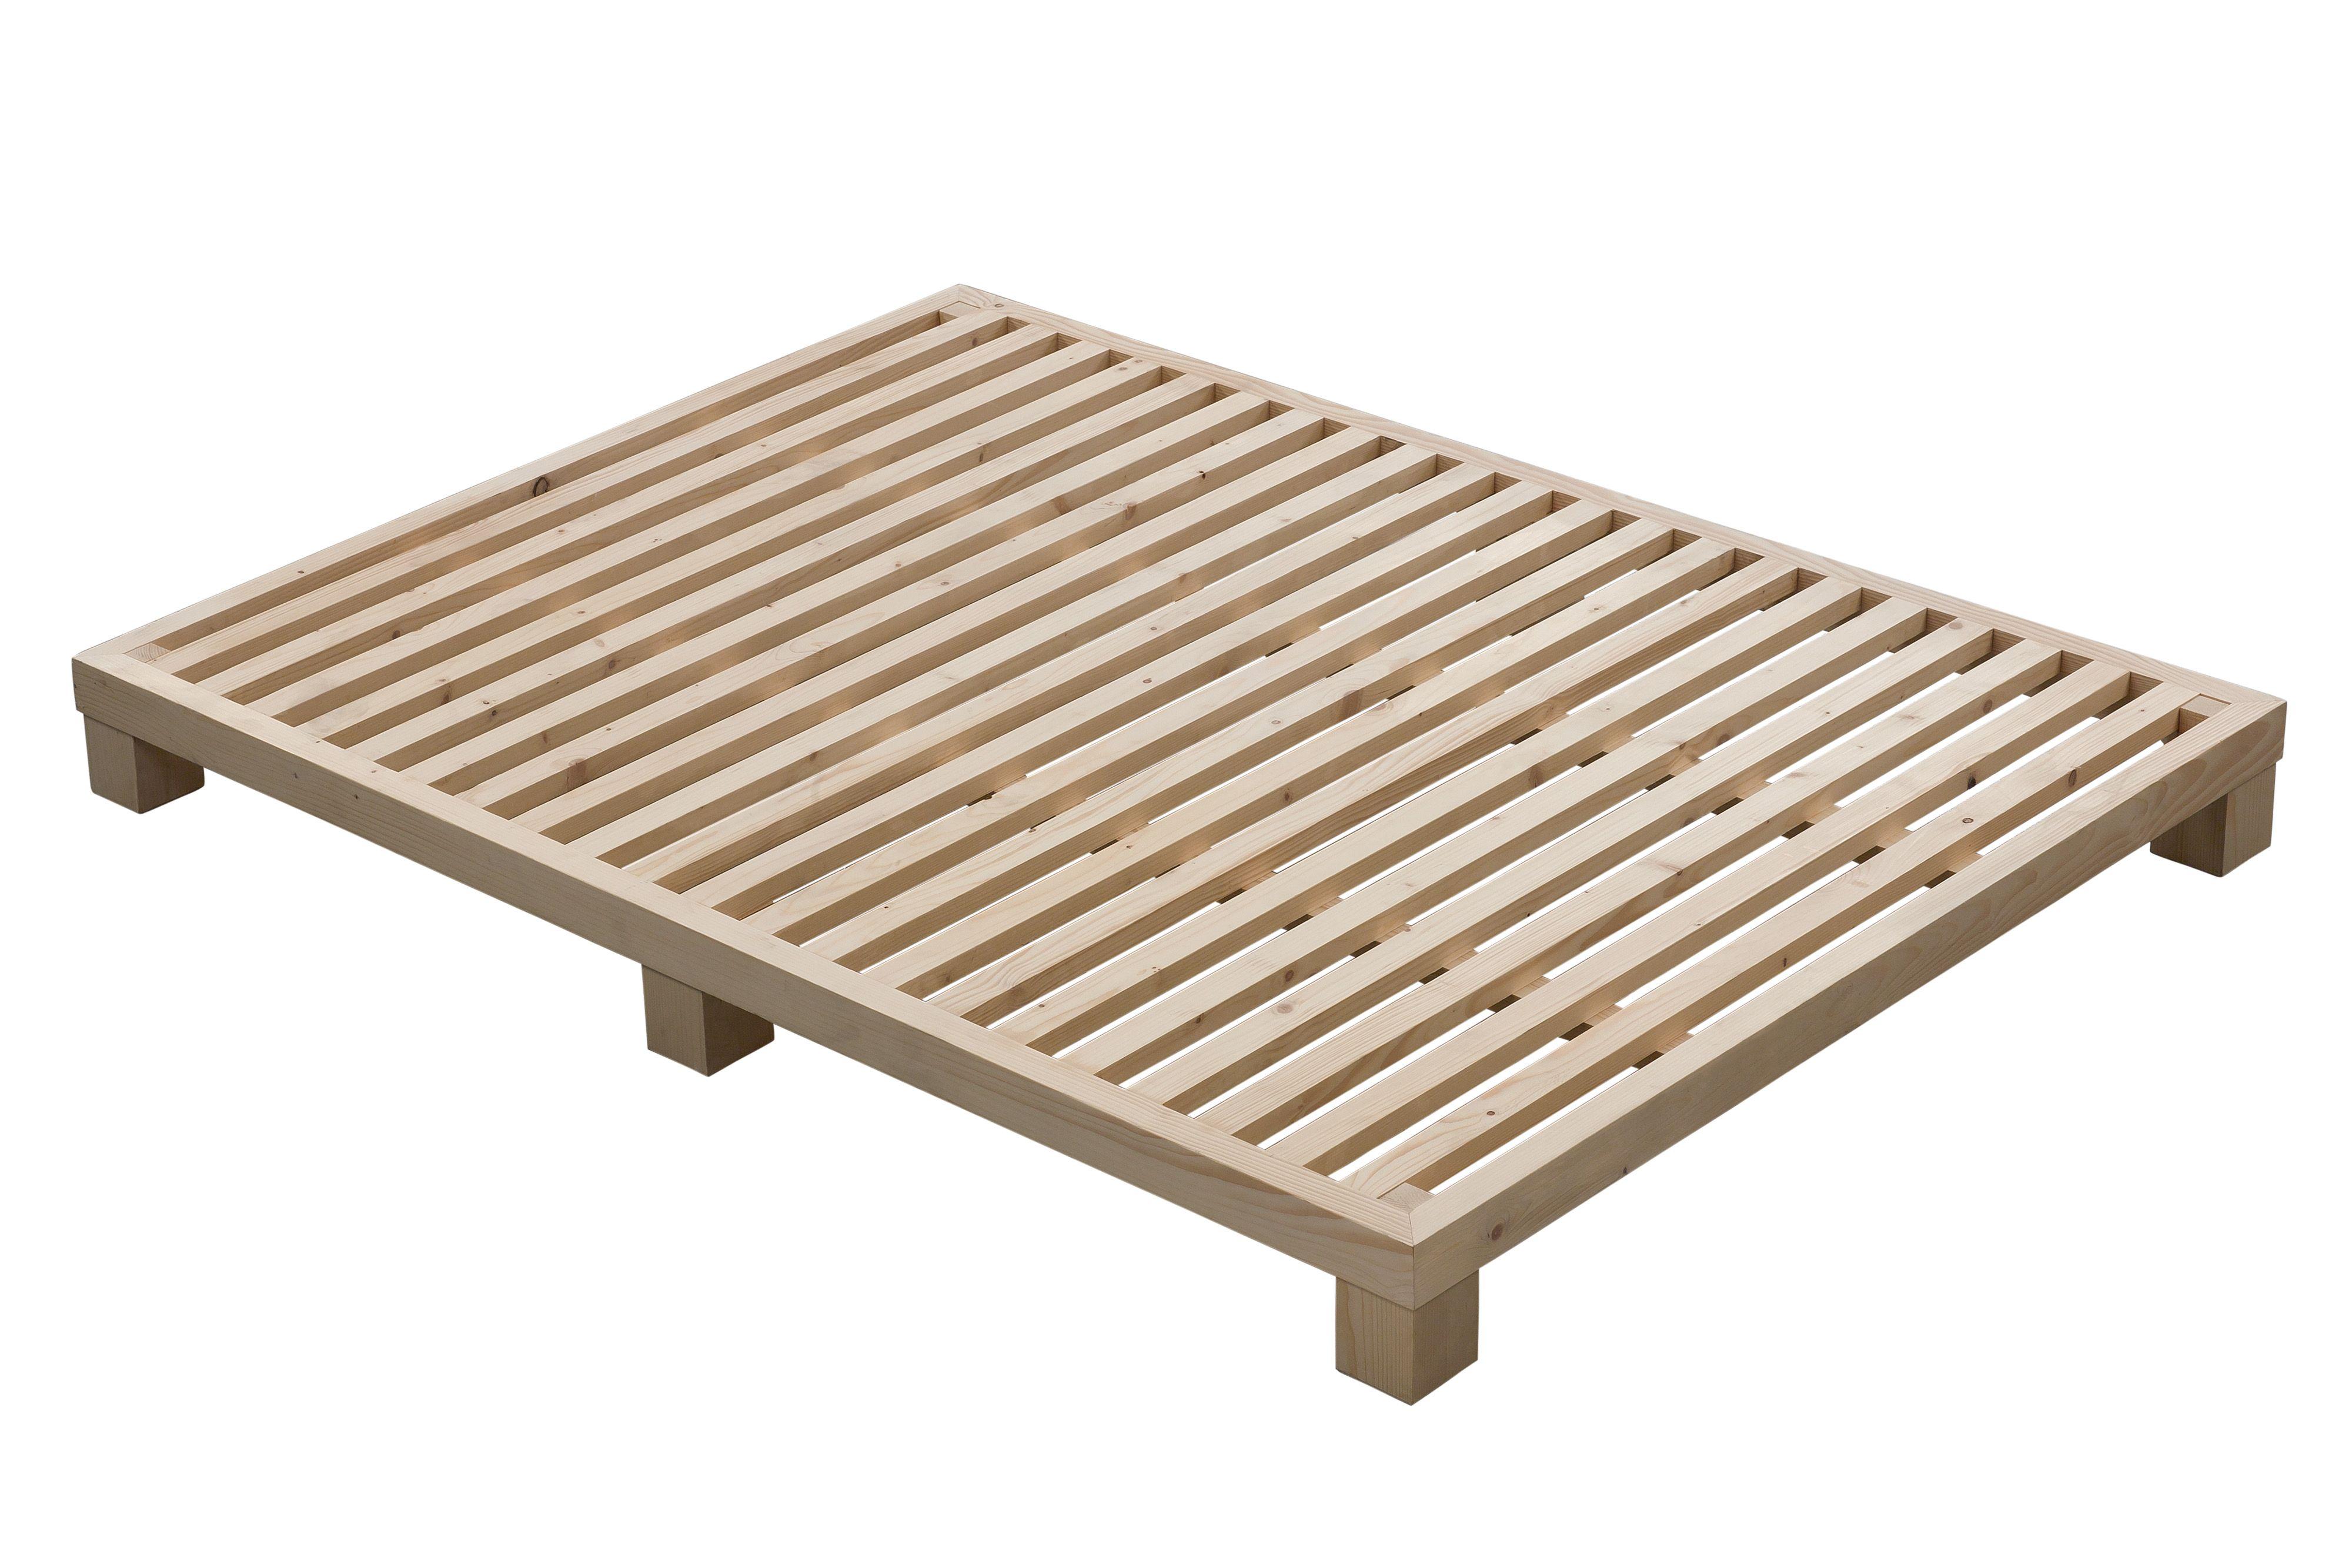 TATAMI NORDIK. Bastidor de madera maciza 65x40. Madera de pino ...